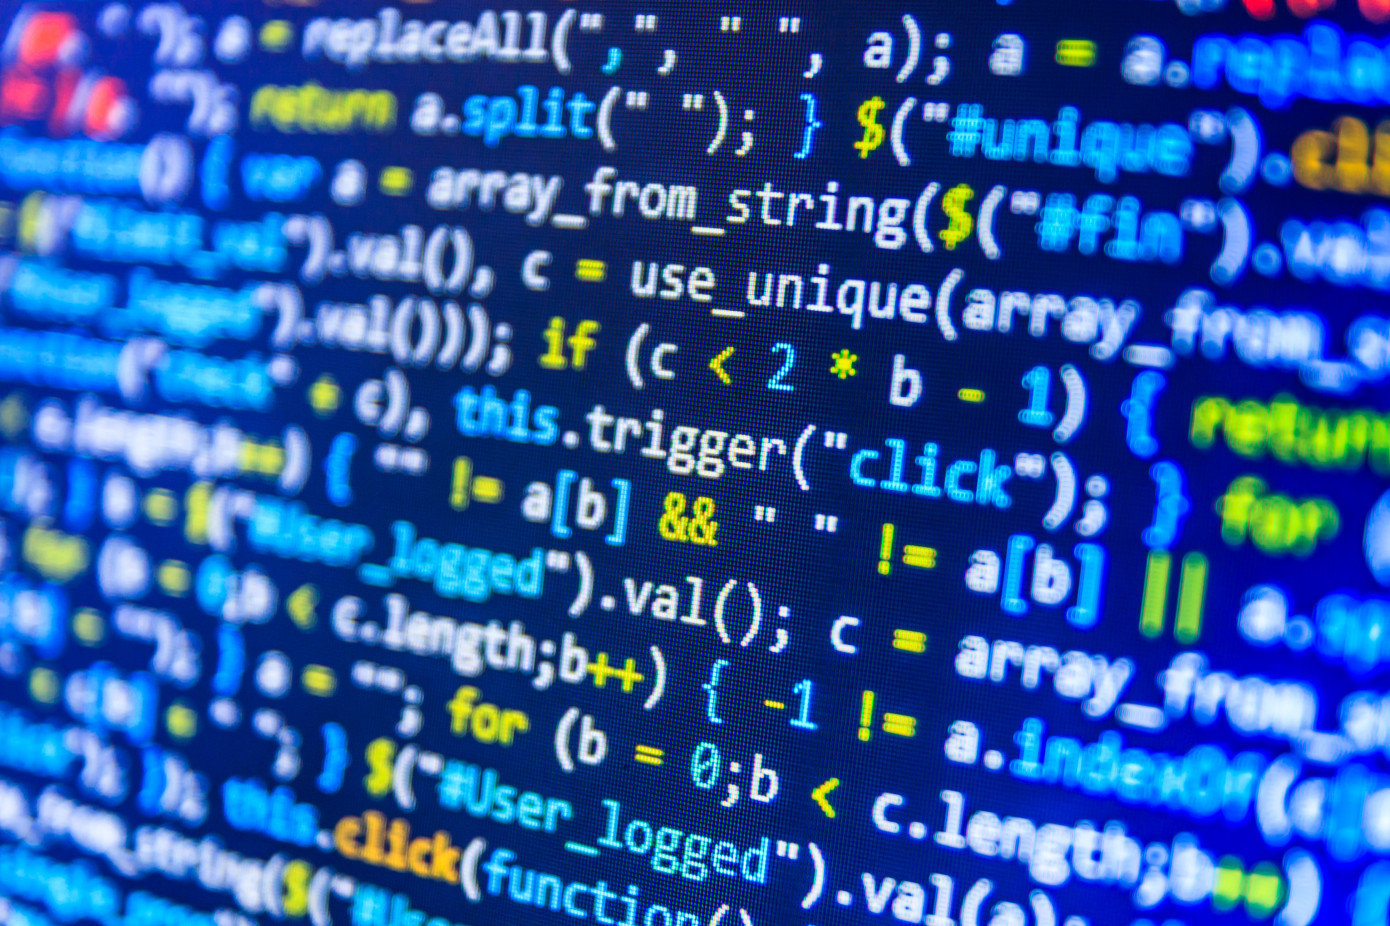 programlama dili kitabı seçimi